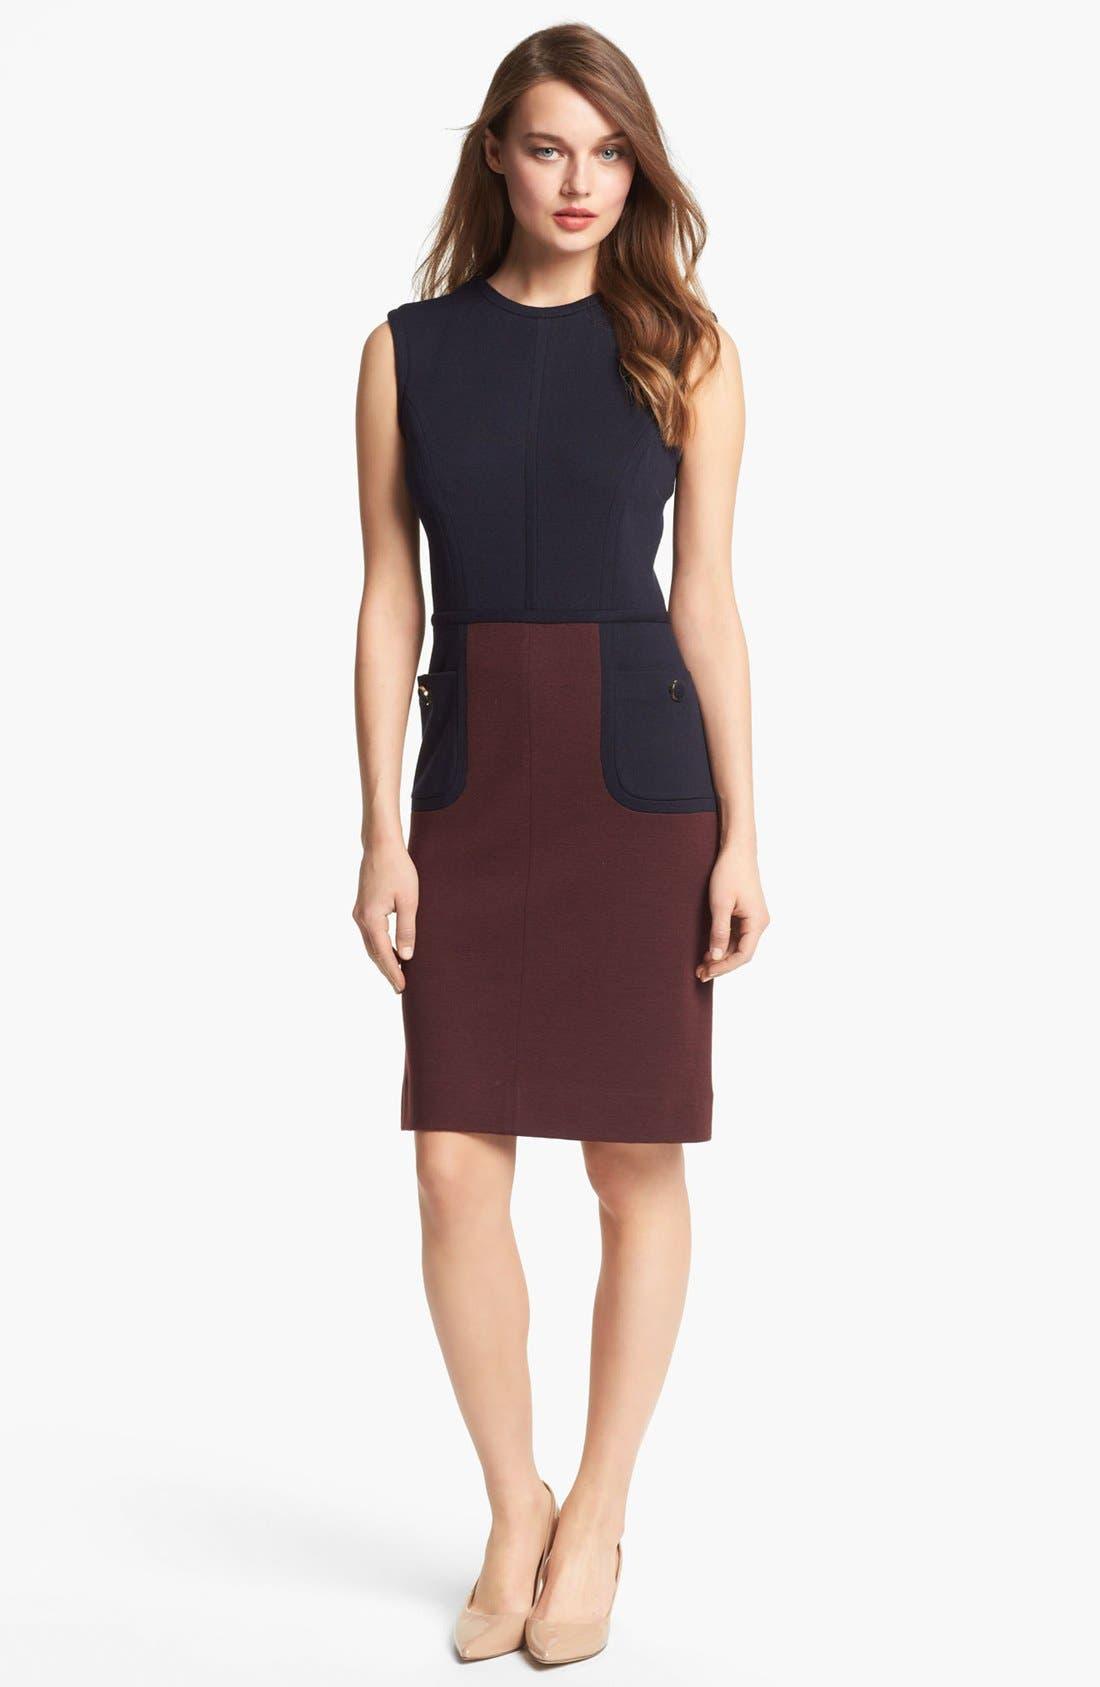 Alternate Image 1 Selected - Tory Burch 'Brianna' Colorblock Sheath Dress